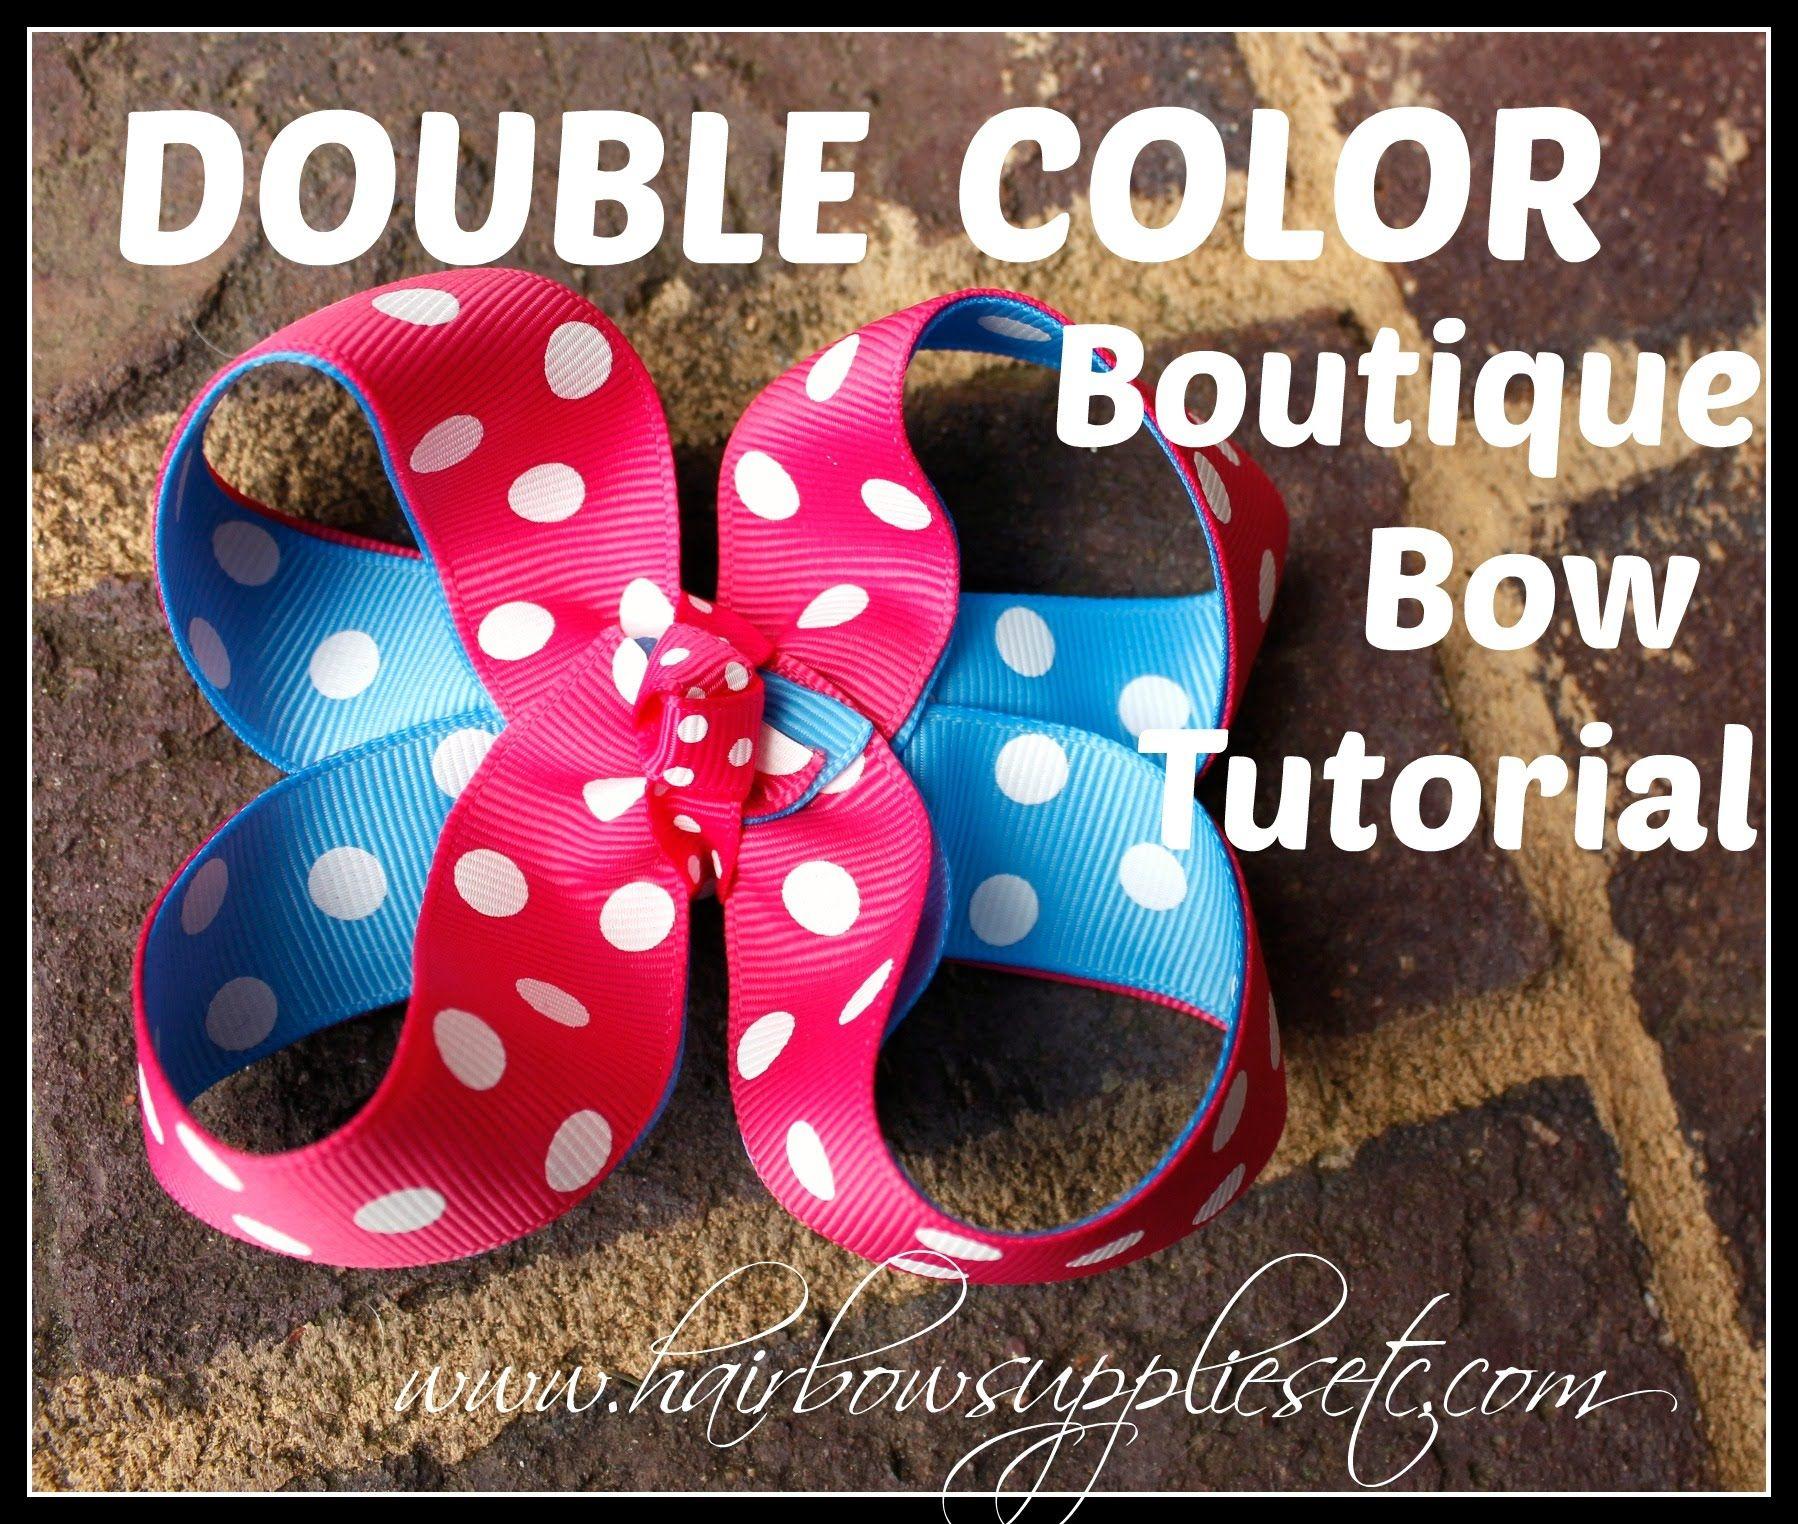 Double color boutique hair bow tutorial hairbow supplies etc double color boutique hair bow tutorial hairbow supplies etc baditri Image collections